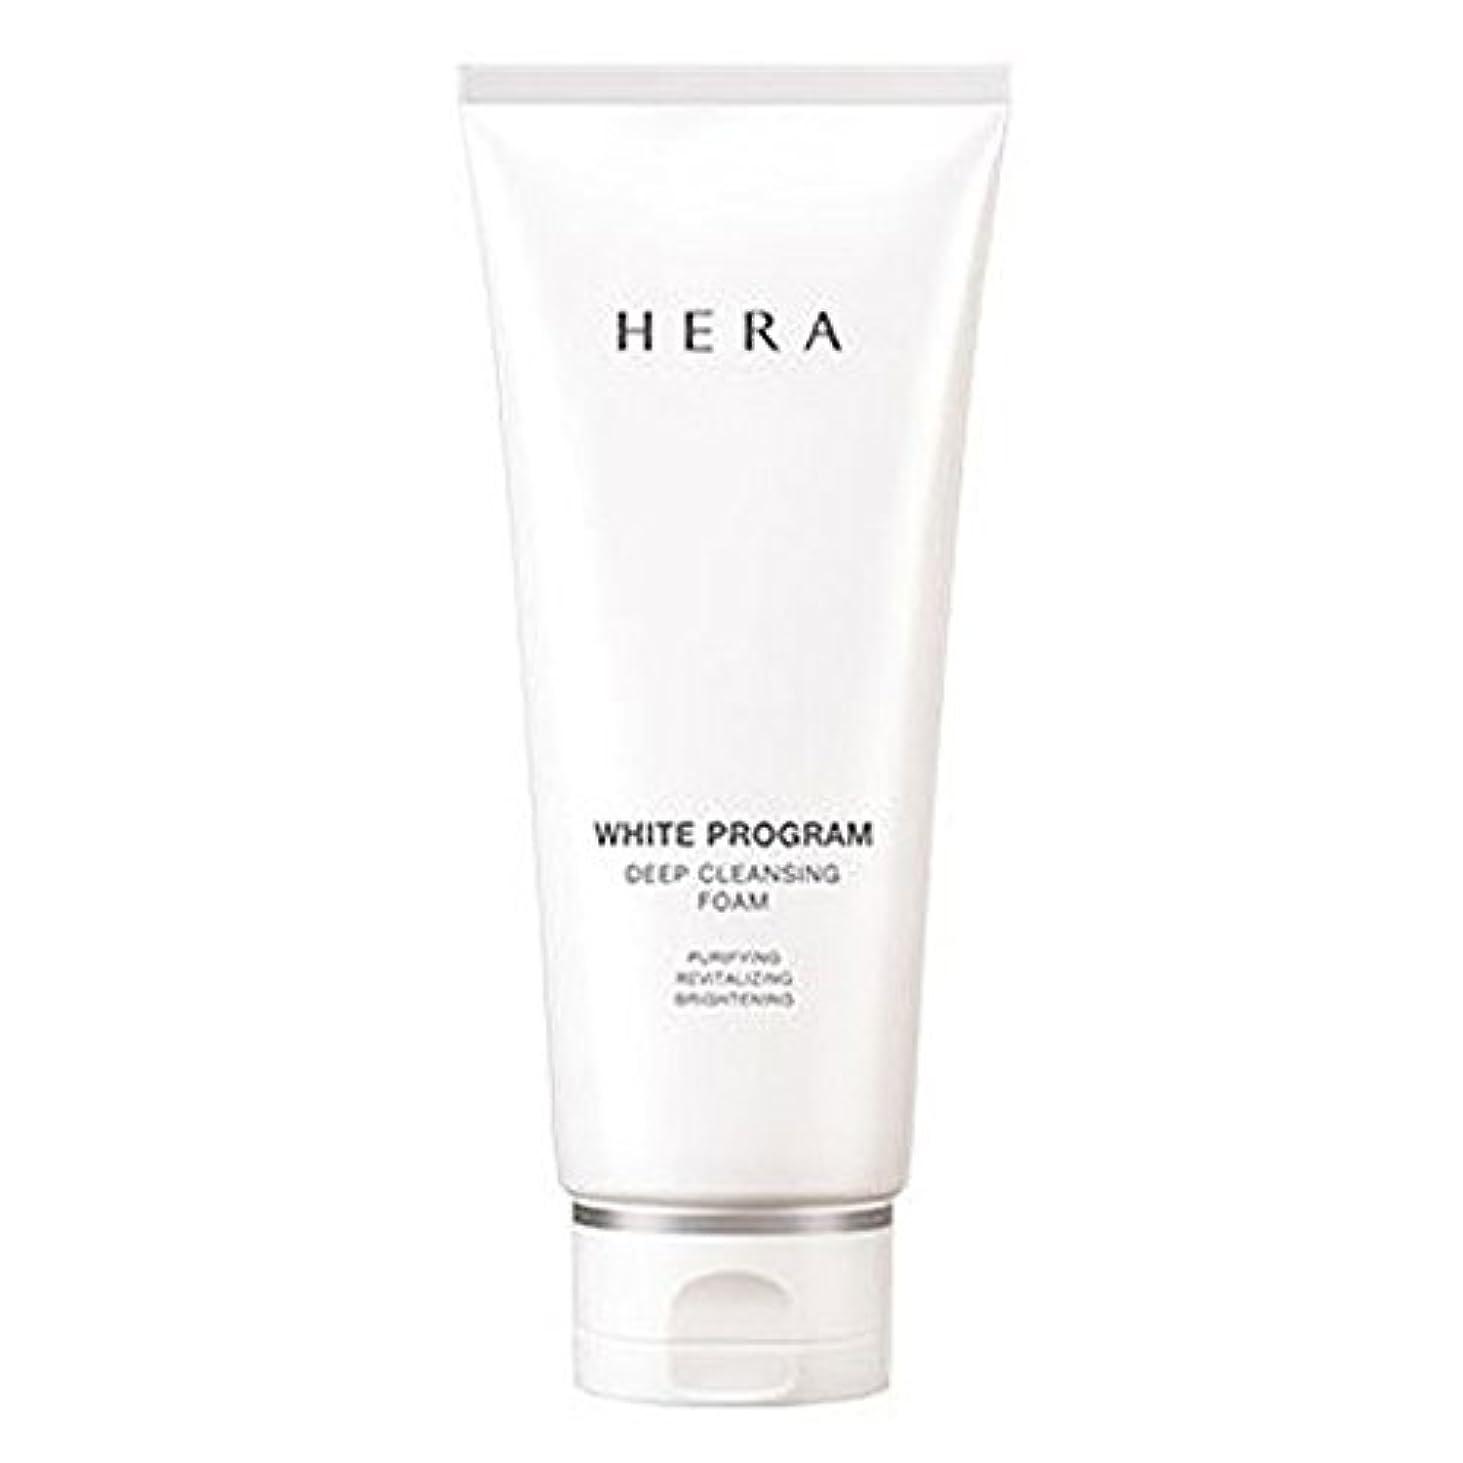 HERA(ヘラ) ホワイトプログラム ディープクレンジングフォーム200ml